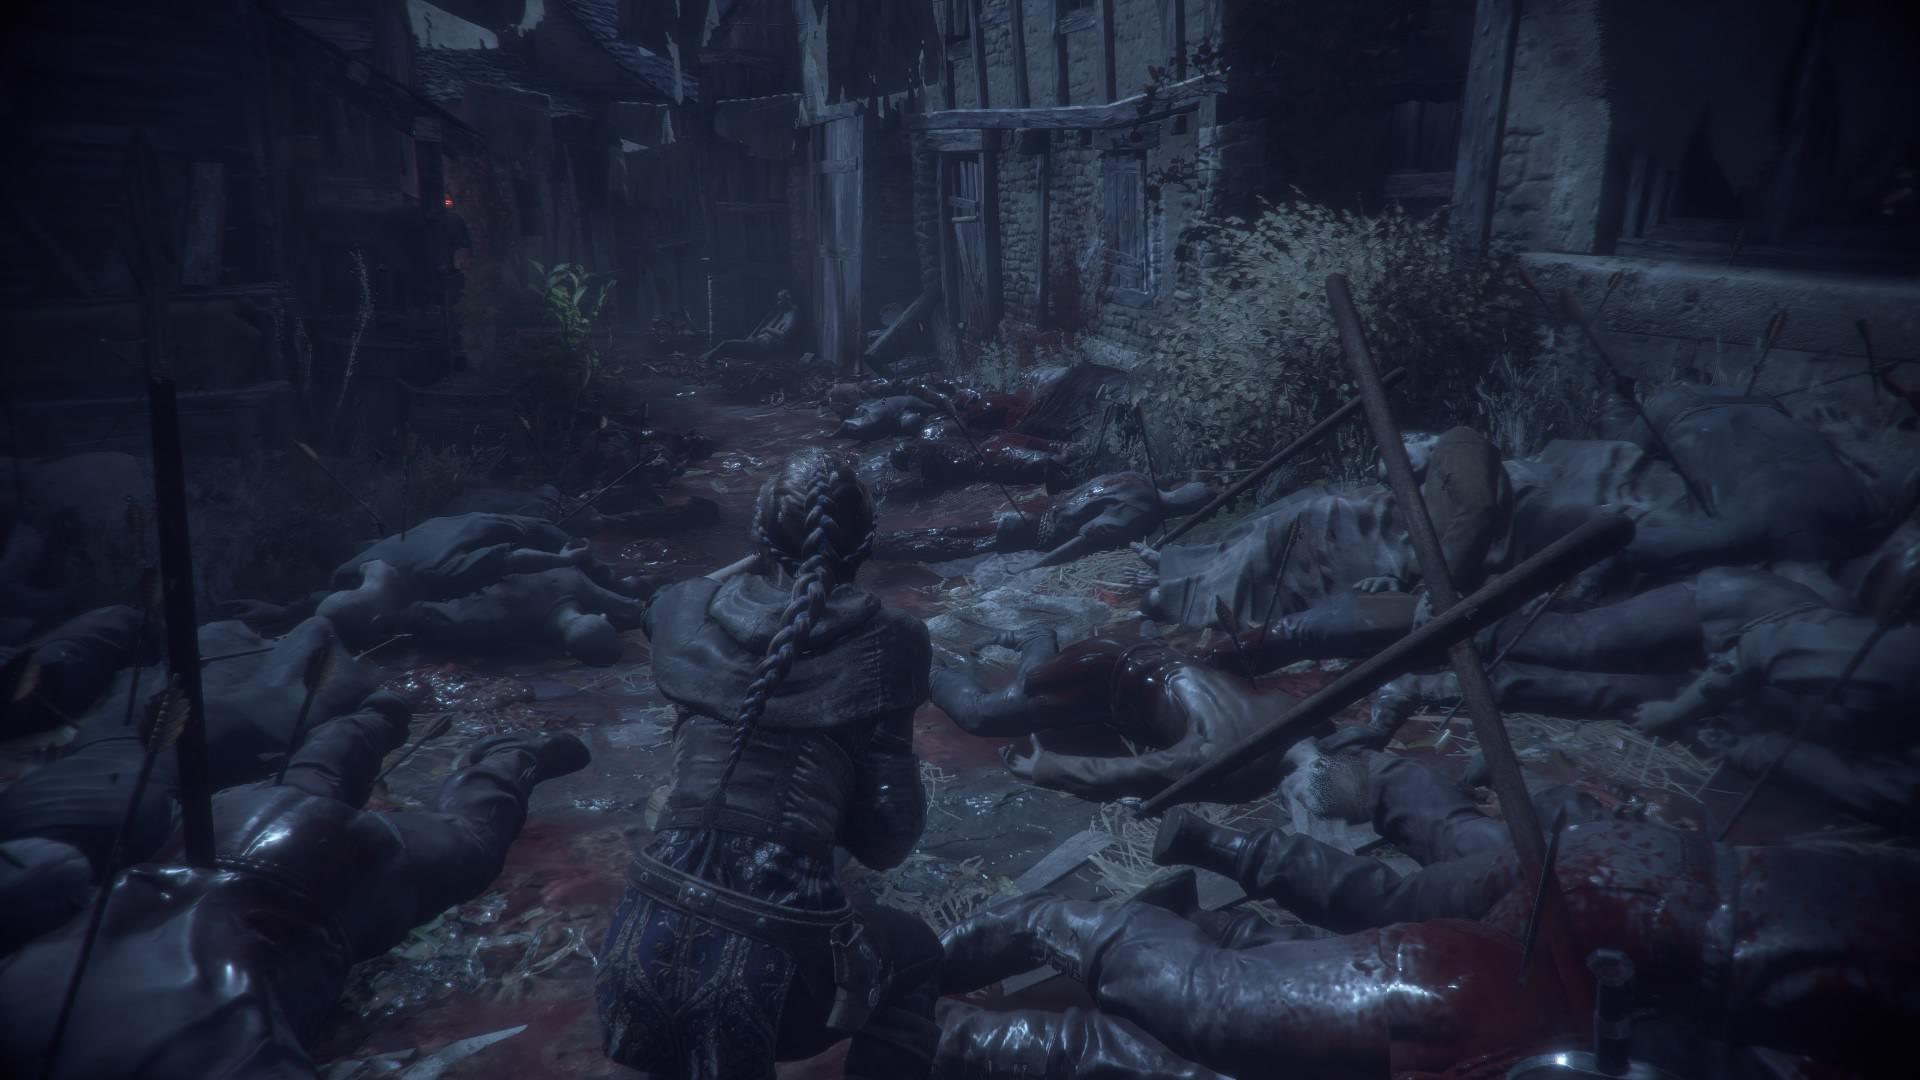 [JV] A Plague Tale : Innocence (2019, PS4) - Dark Side Reviews